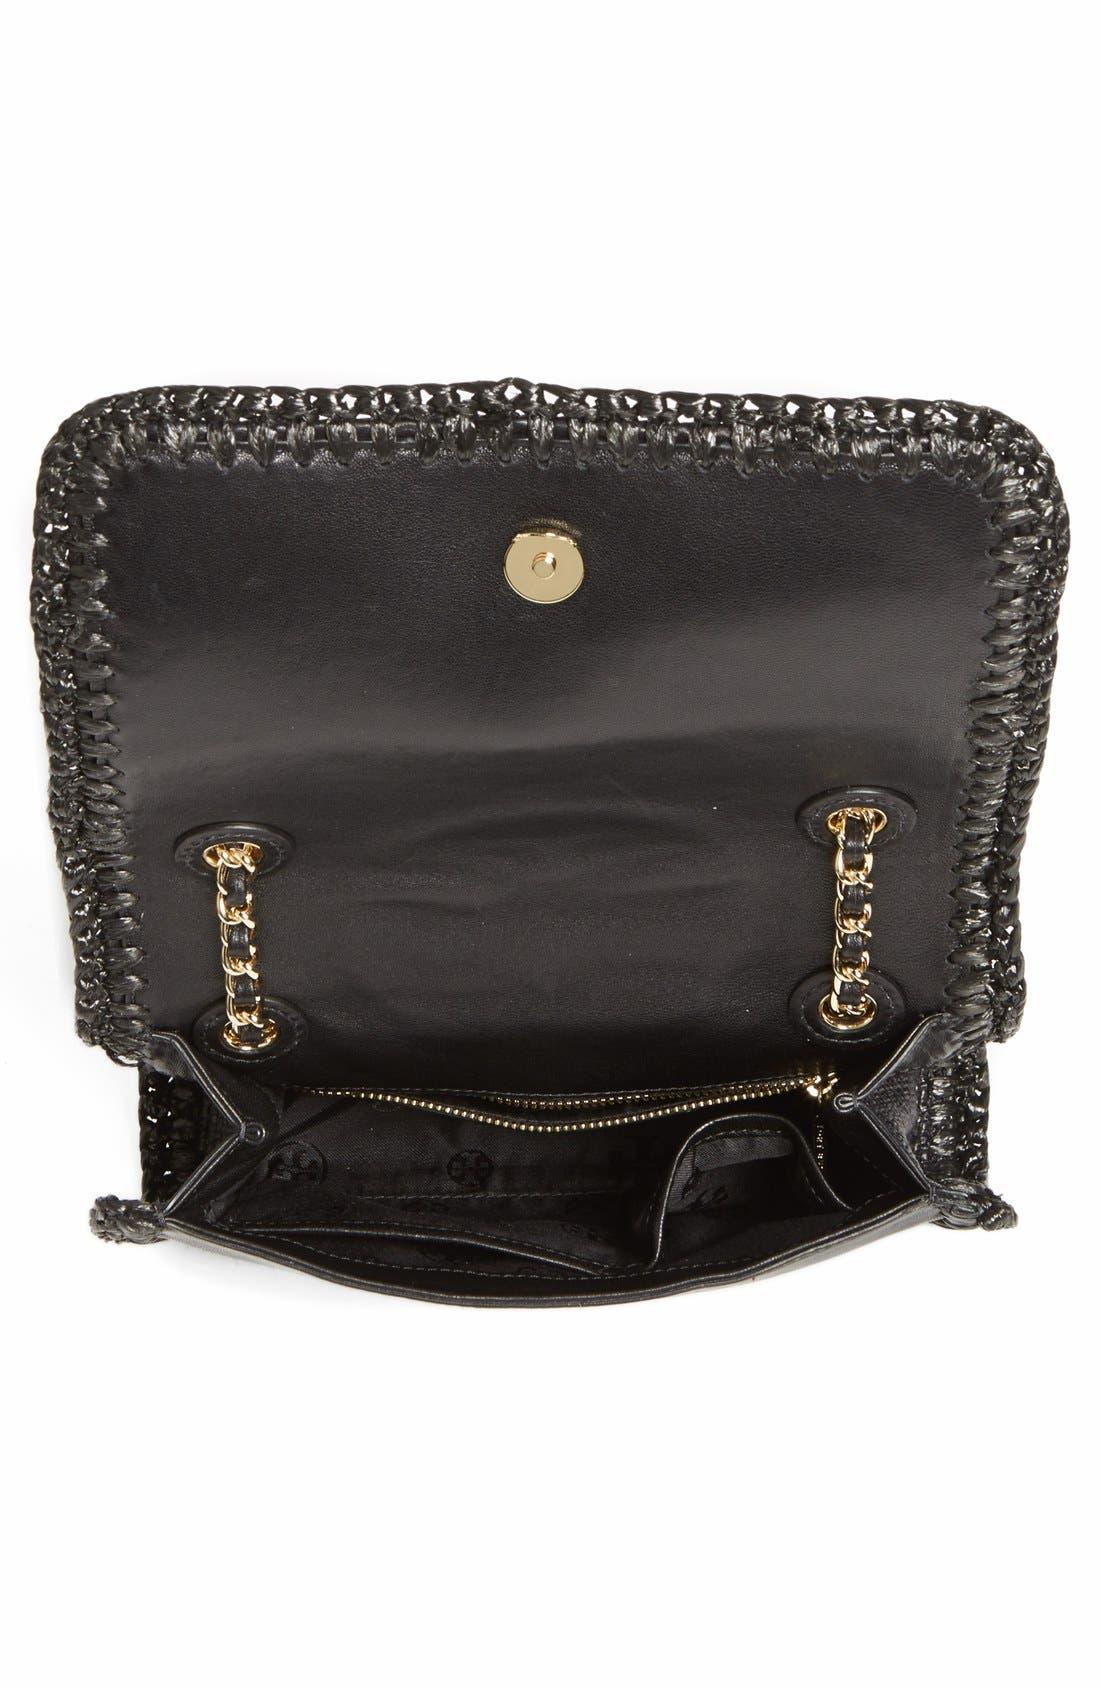 Alternate Image 3  - Tory Burch 'Medium Fleming' Woven Shoulder Bag